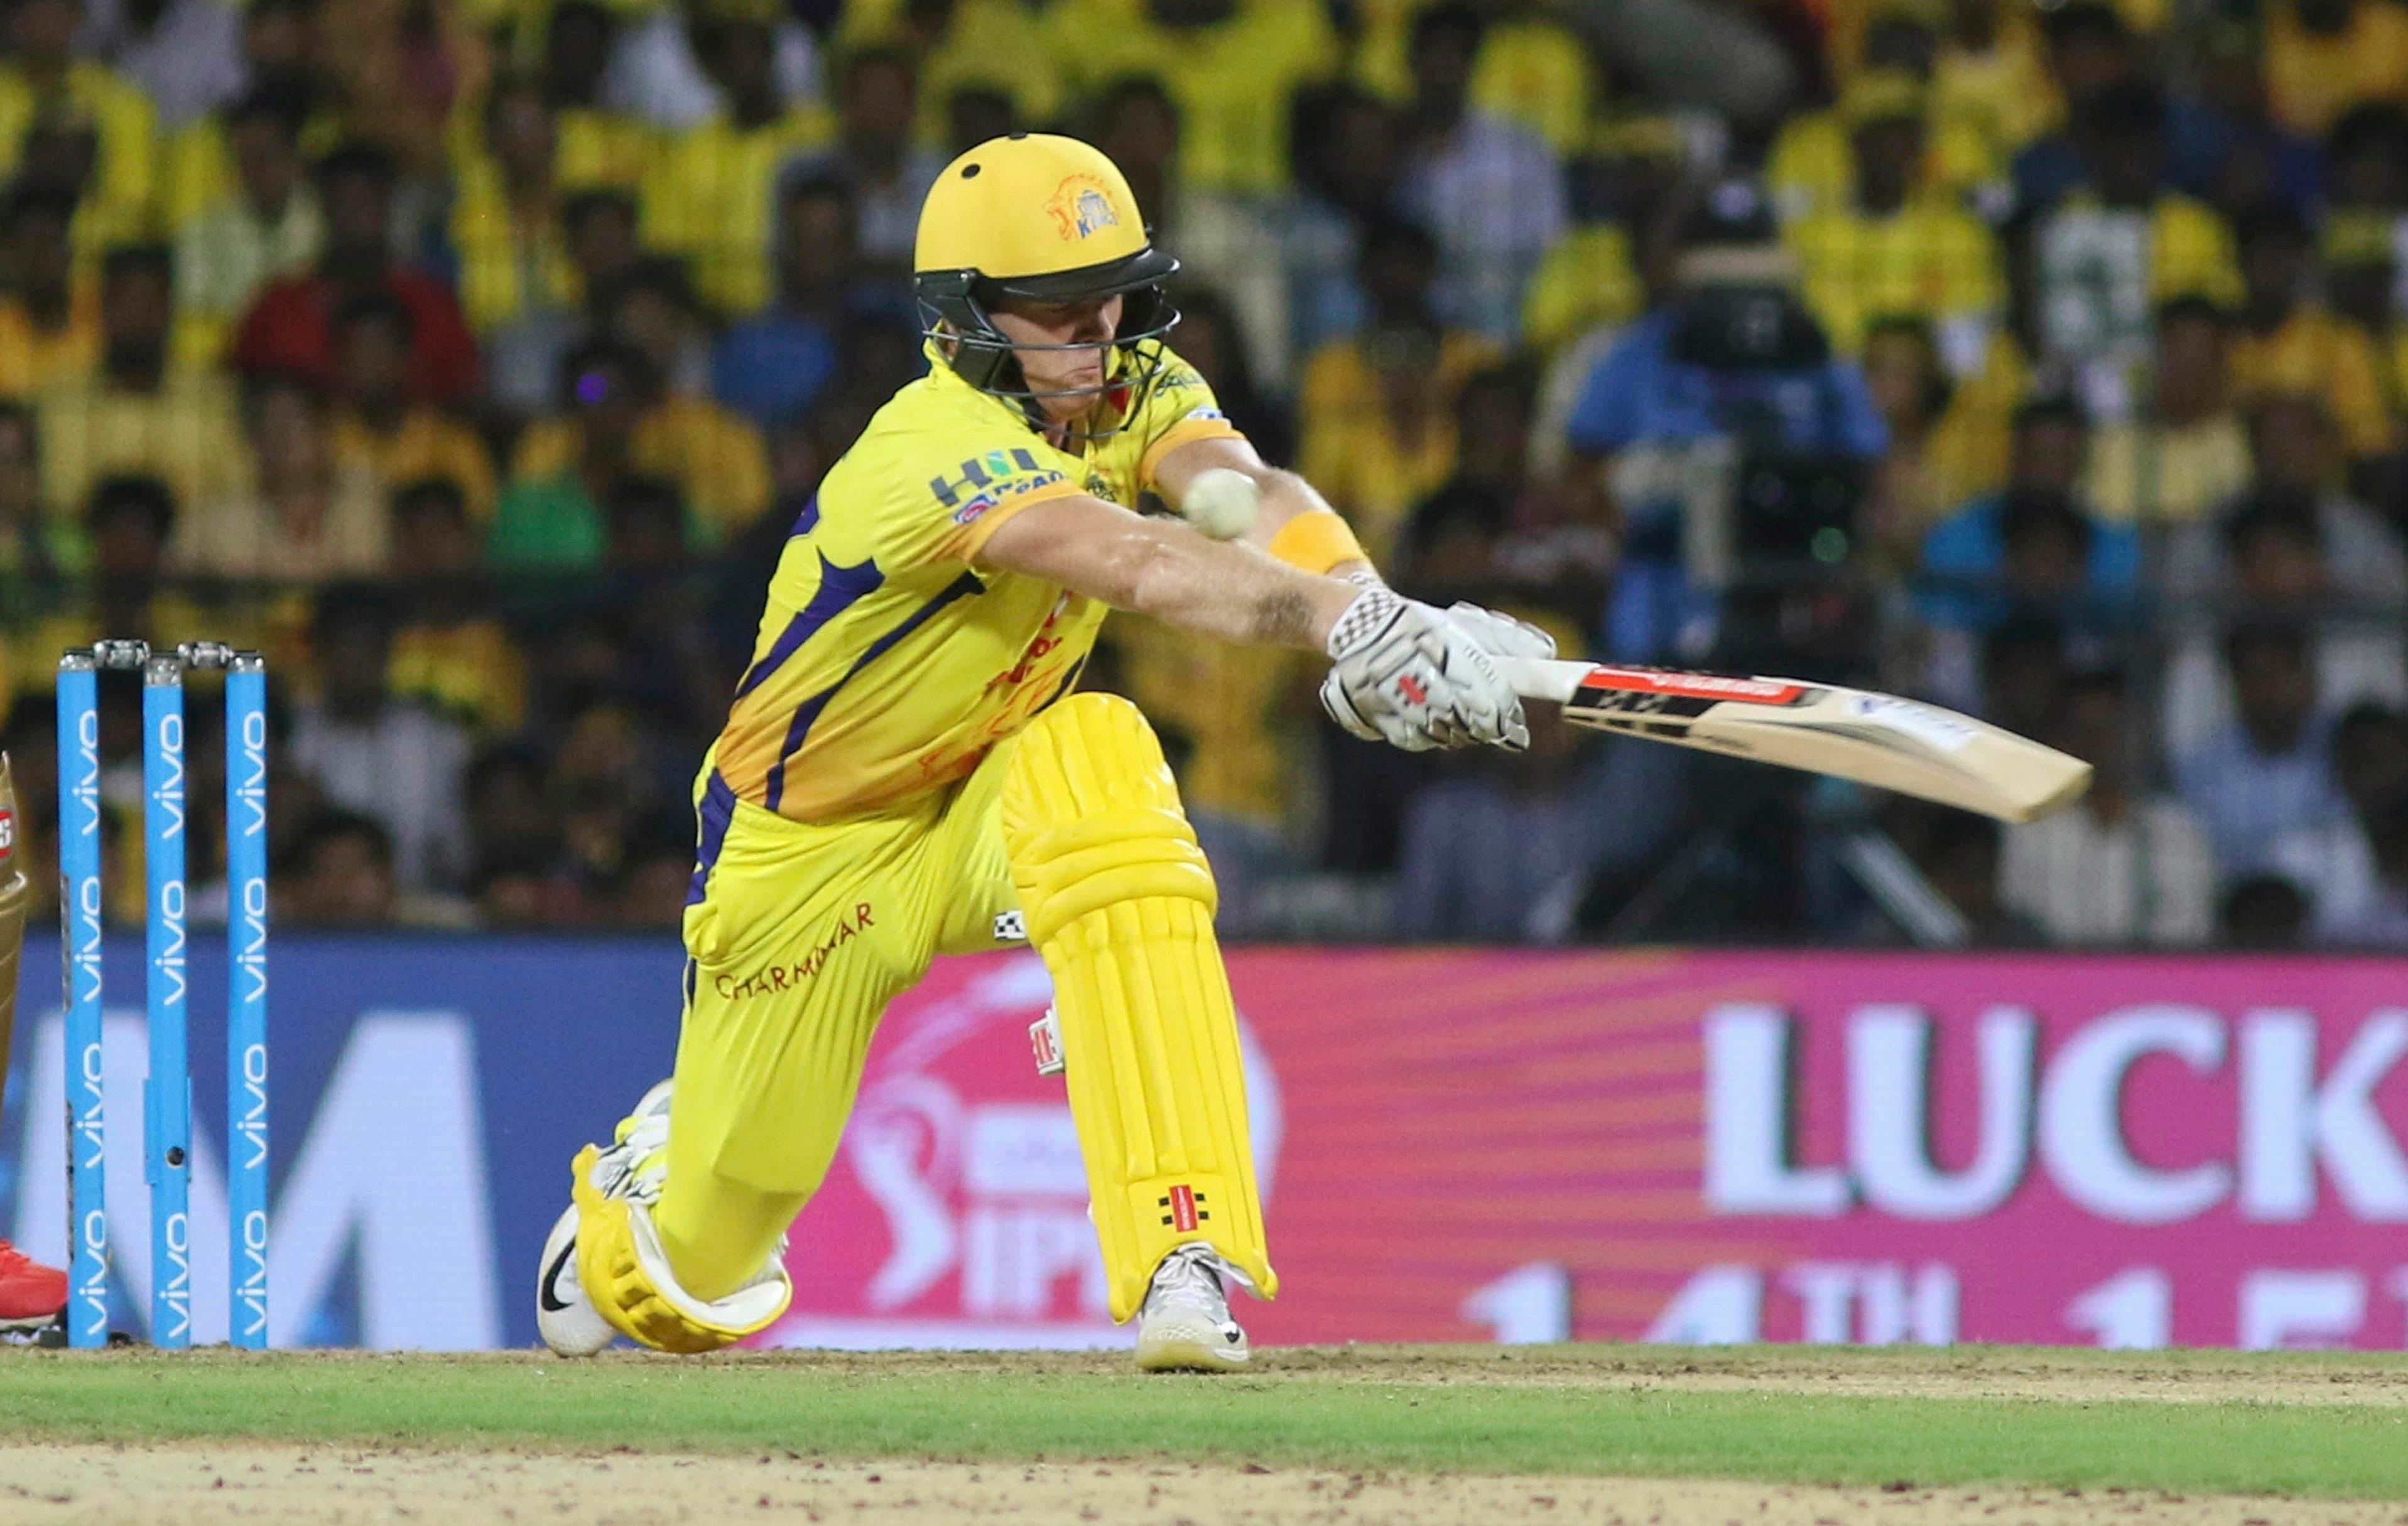 Sam Billings in action for Chennai Super Kings